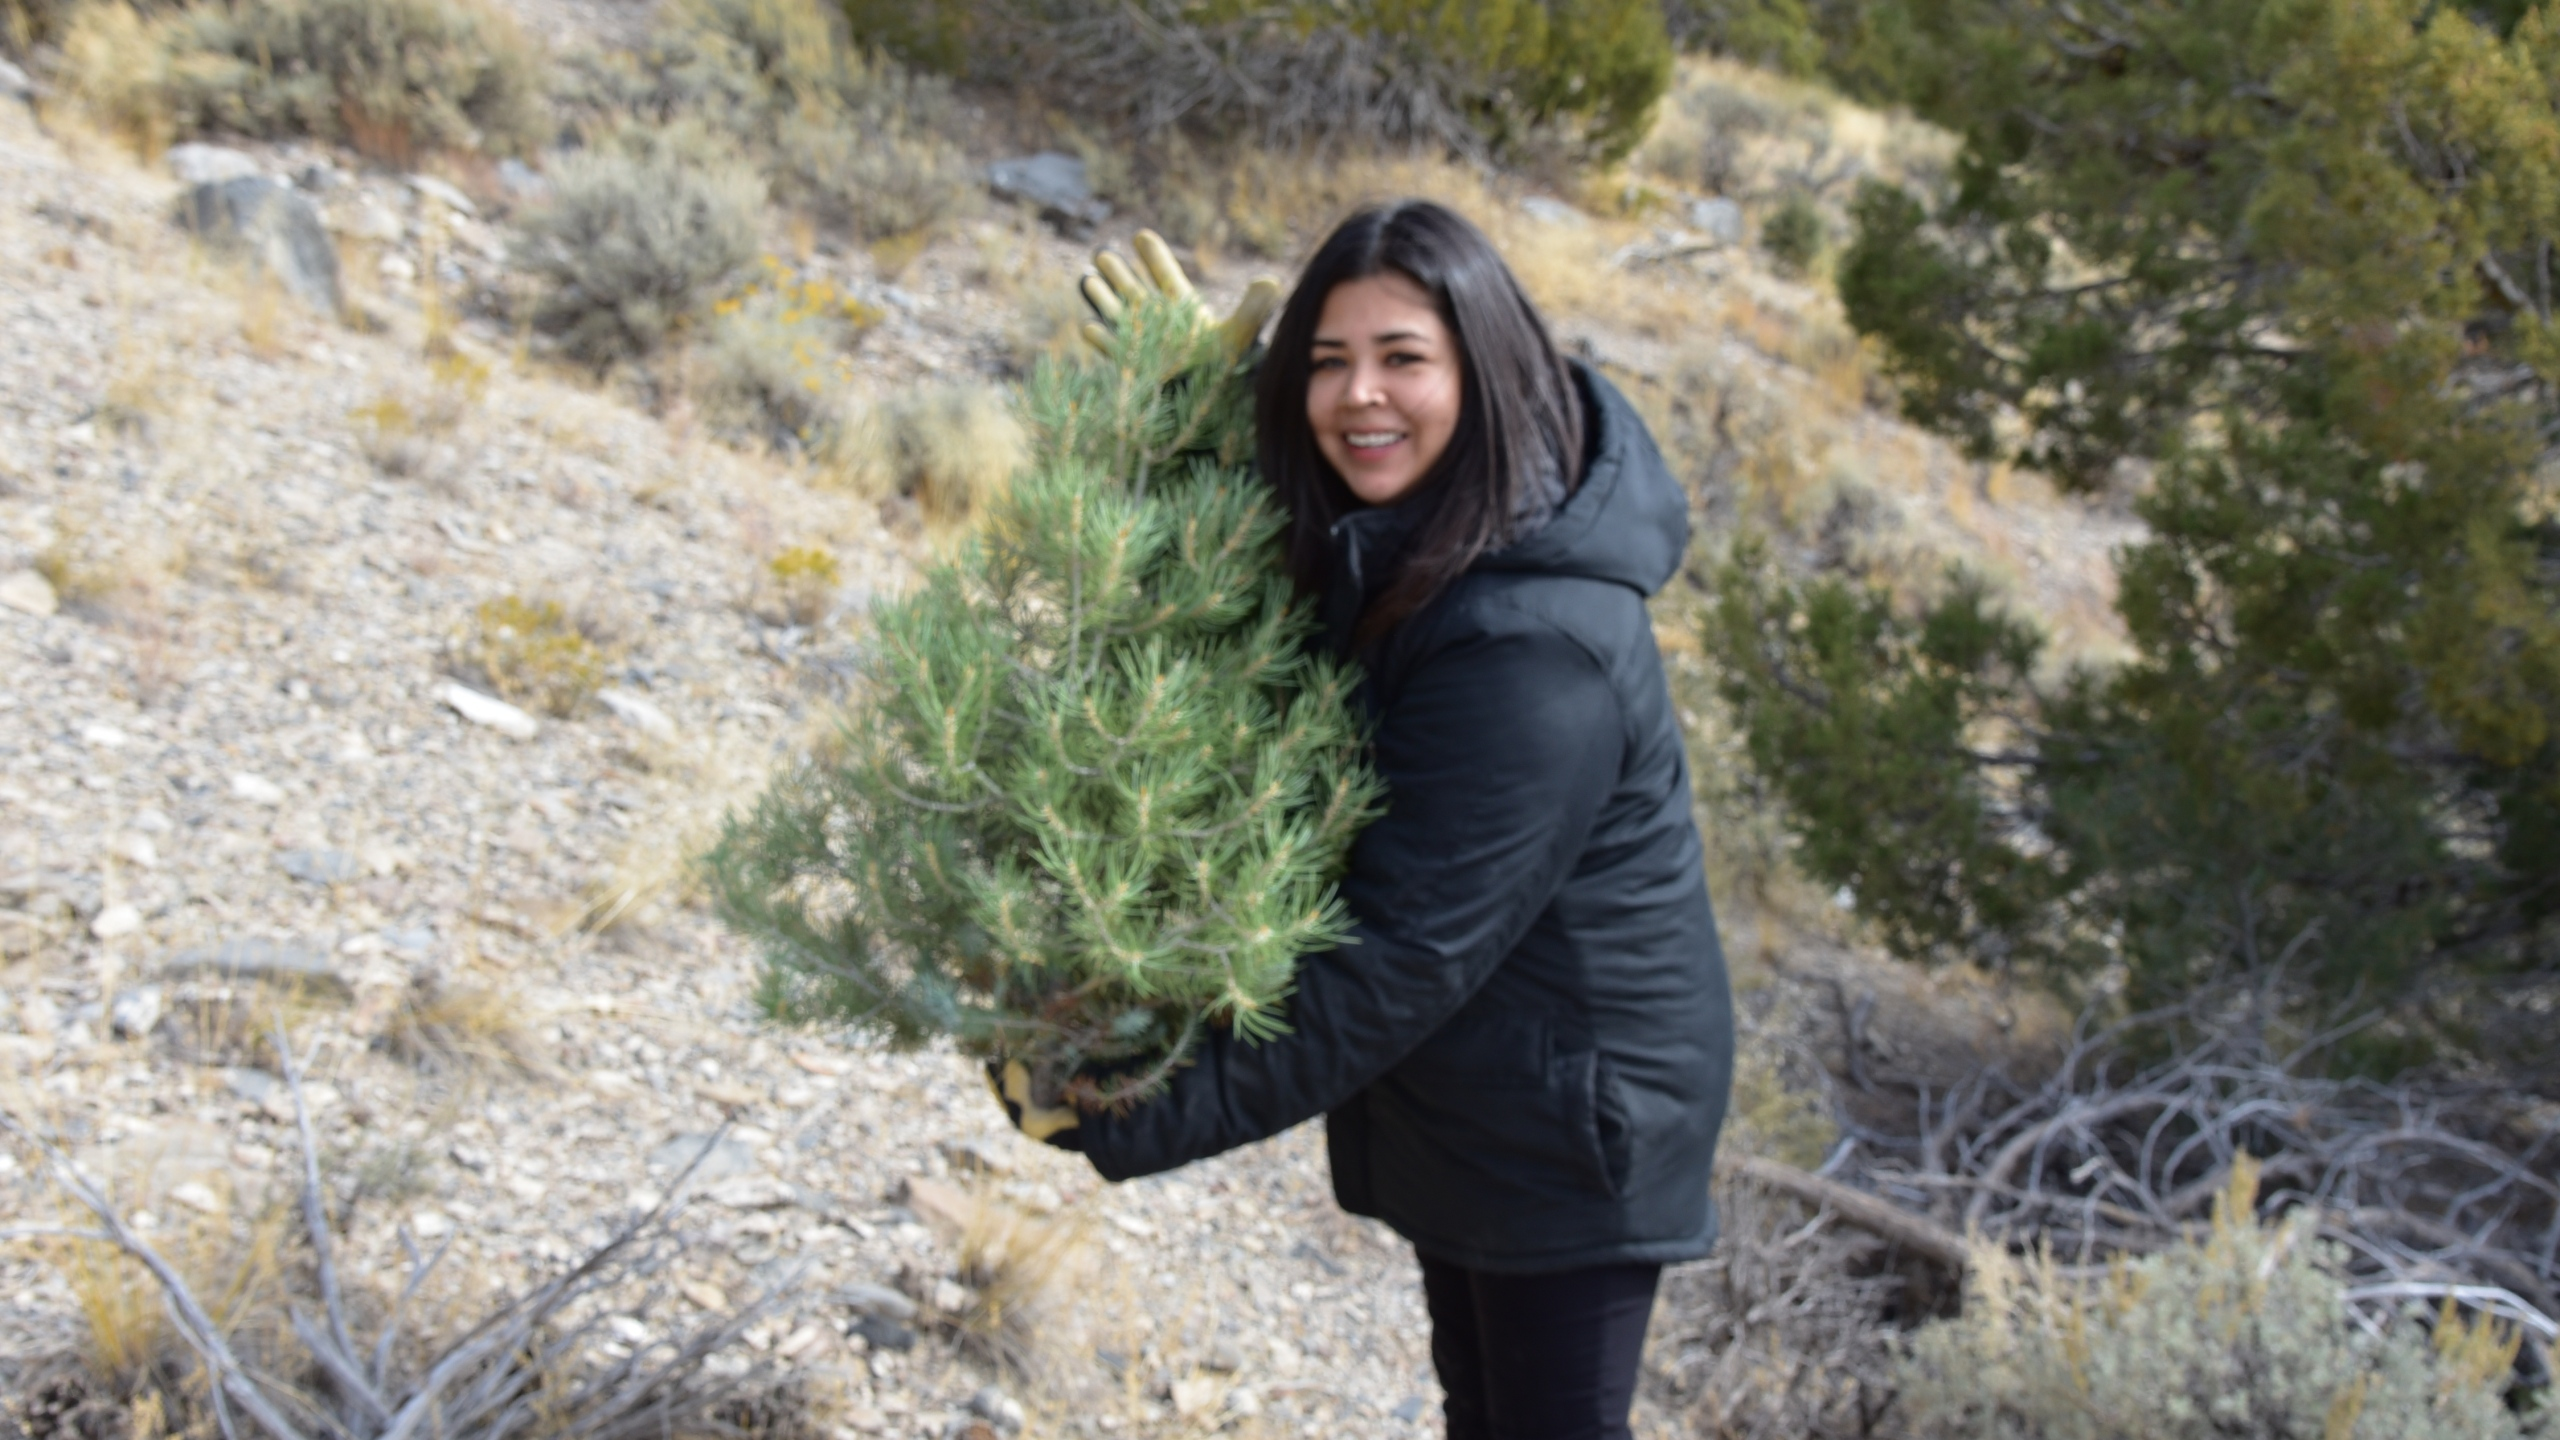 Christmas Help 2020 Utah Where and when Christmas tree permits go on sale in Utah | ABC4 Utah